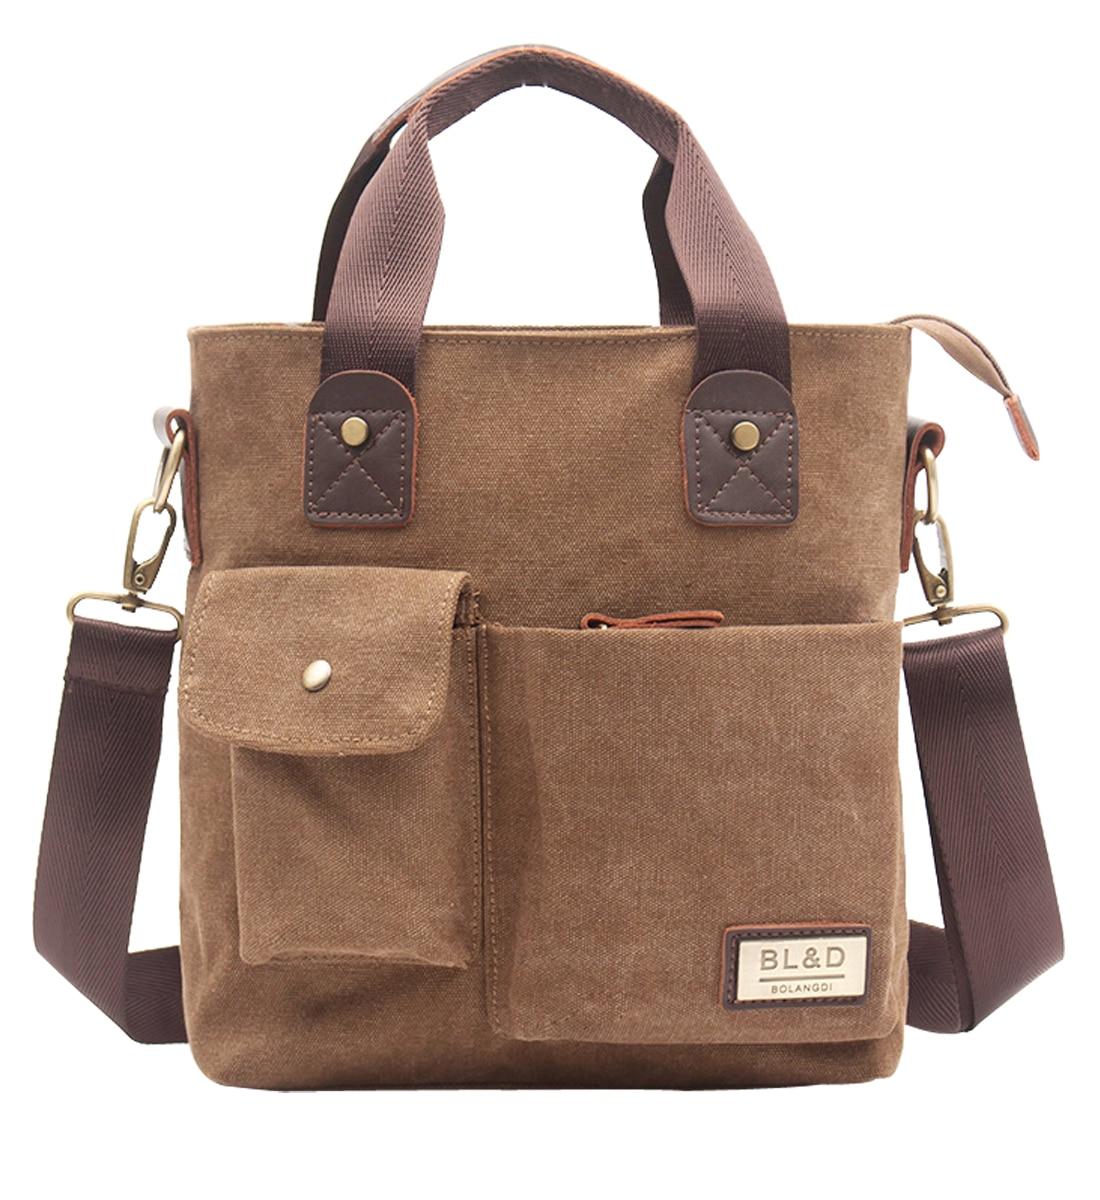 Canvas Leather Crossbody Bags Men Messenger Shoulder Man Handbags Quality Luxury Designer Big Brand Masculina Large Space Bag